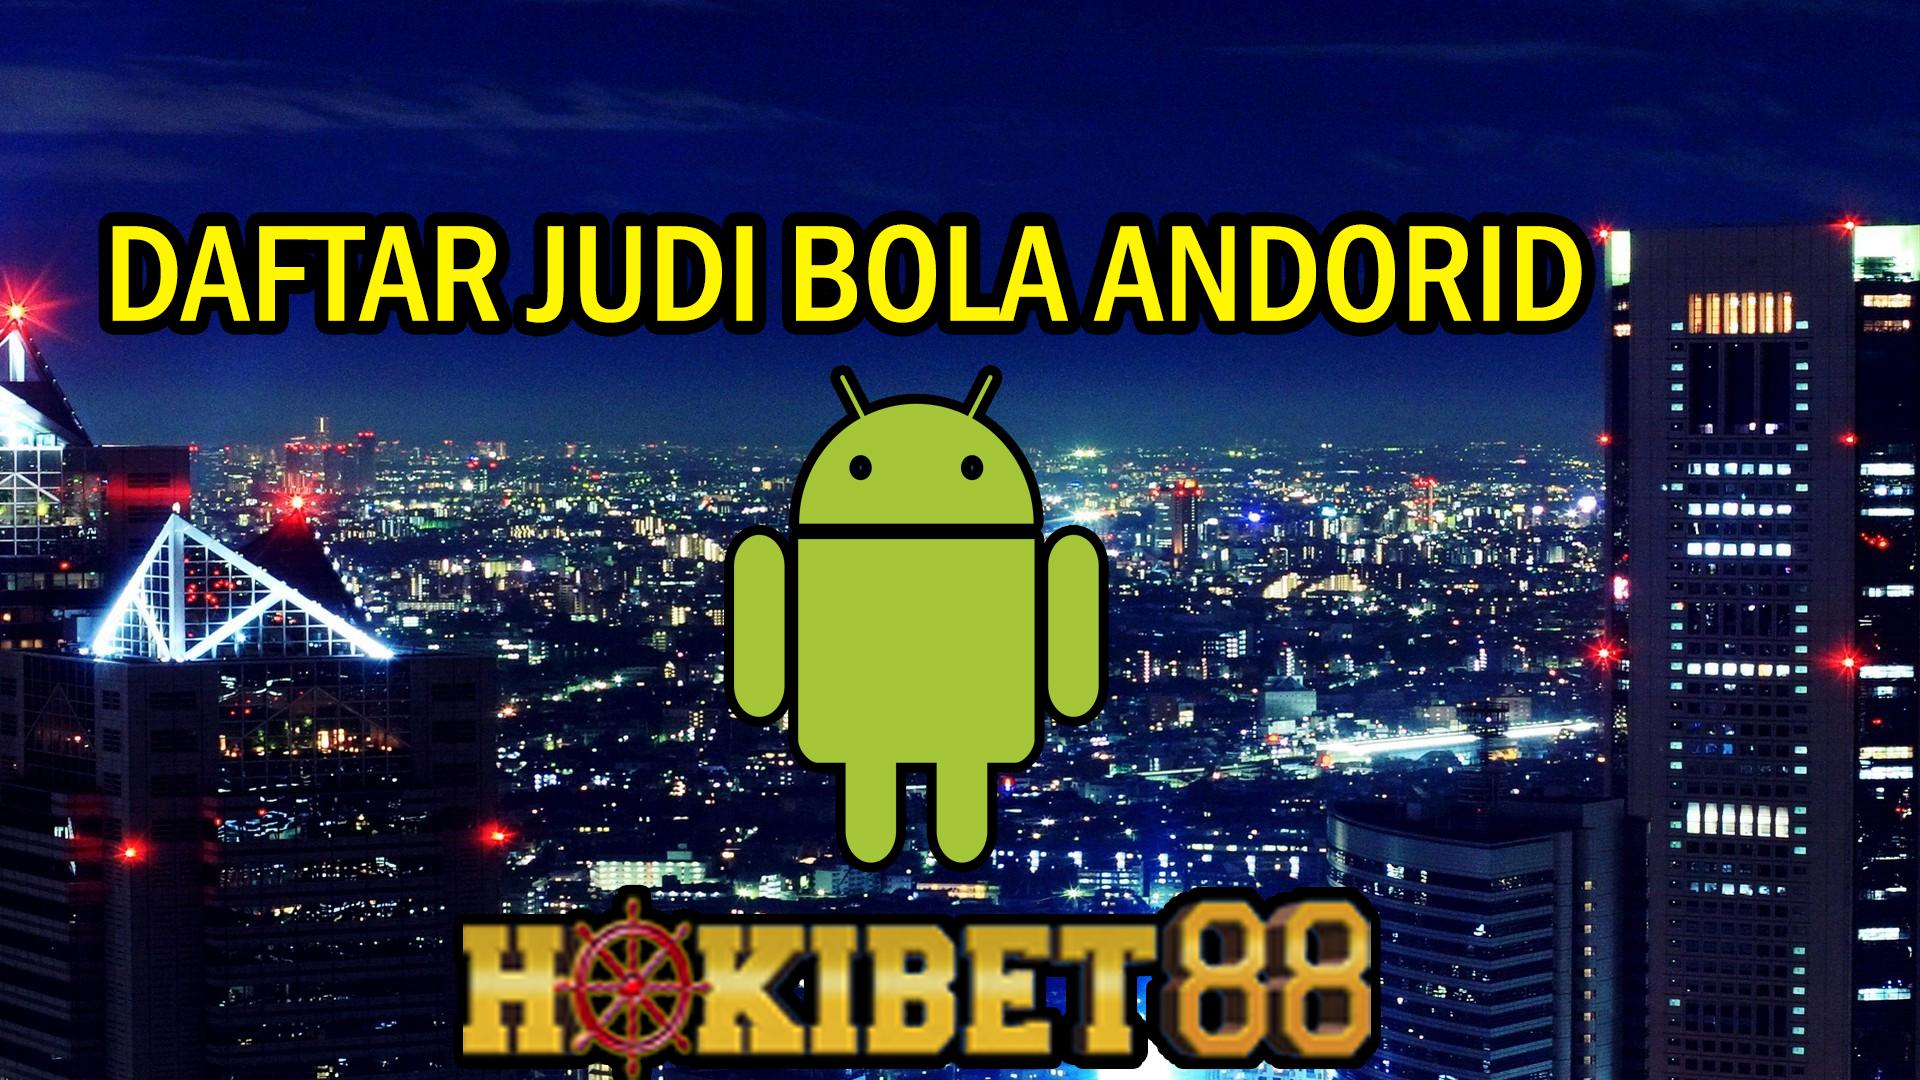 DAFTAR JUDI BOLA ANDROID